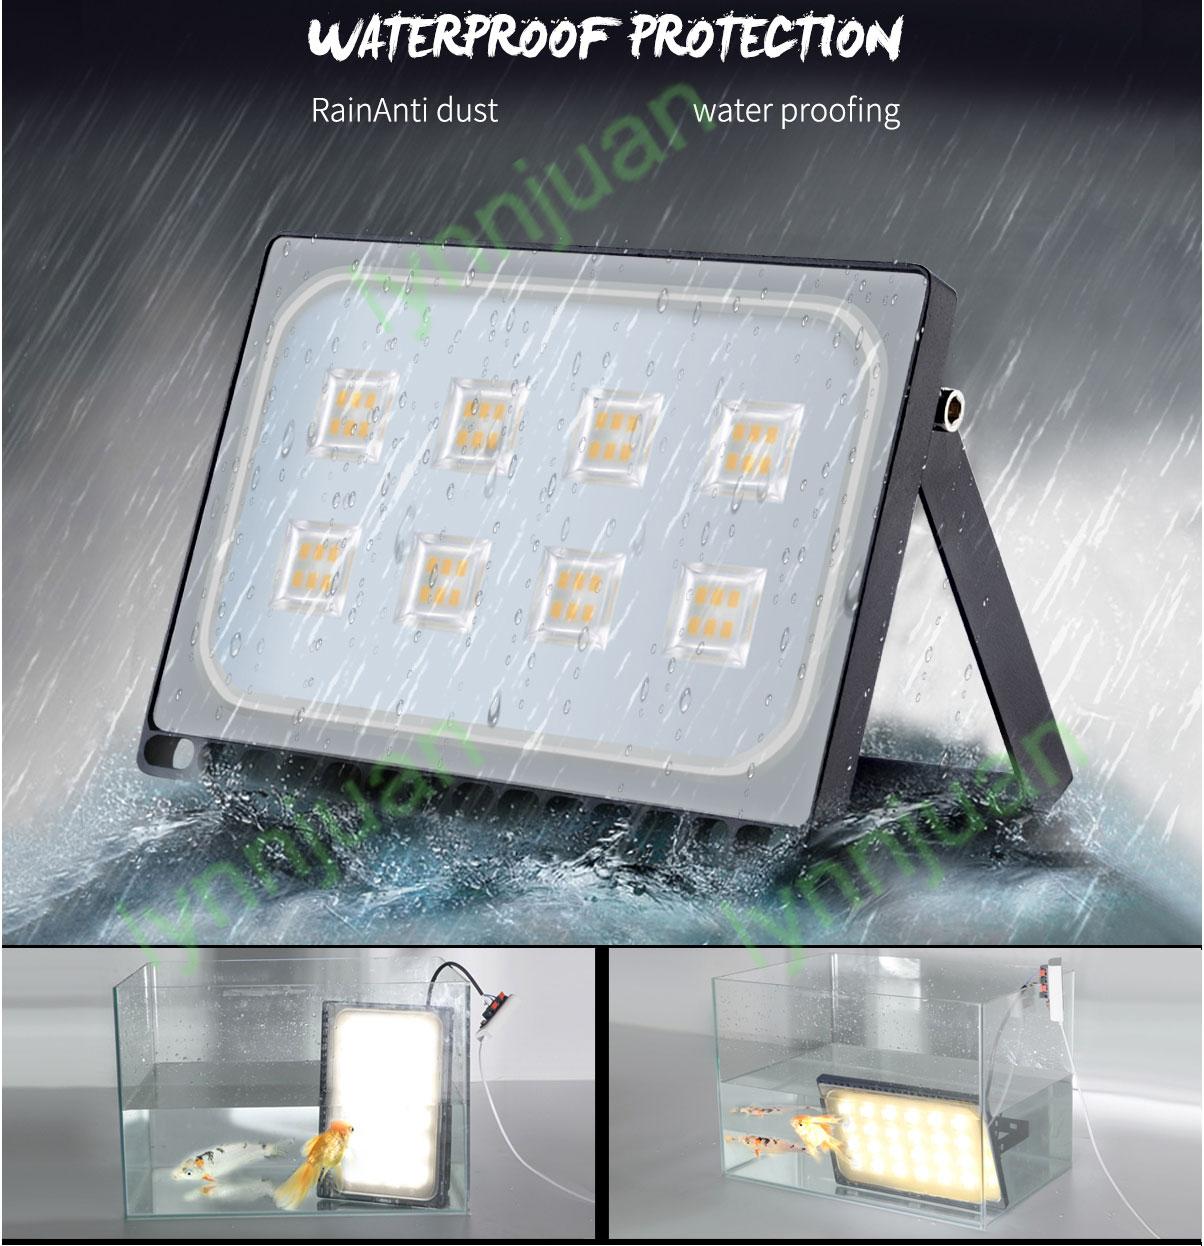 300w Led Flood Light Uk: 500W 300W 200W 150W LED Flood Light 10/20/30/50/100W PIR